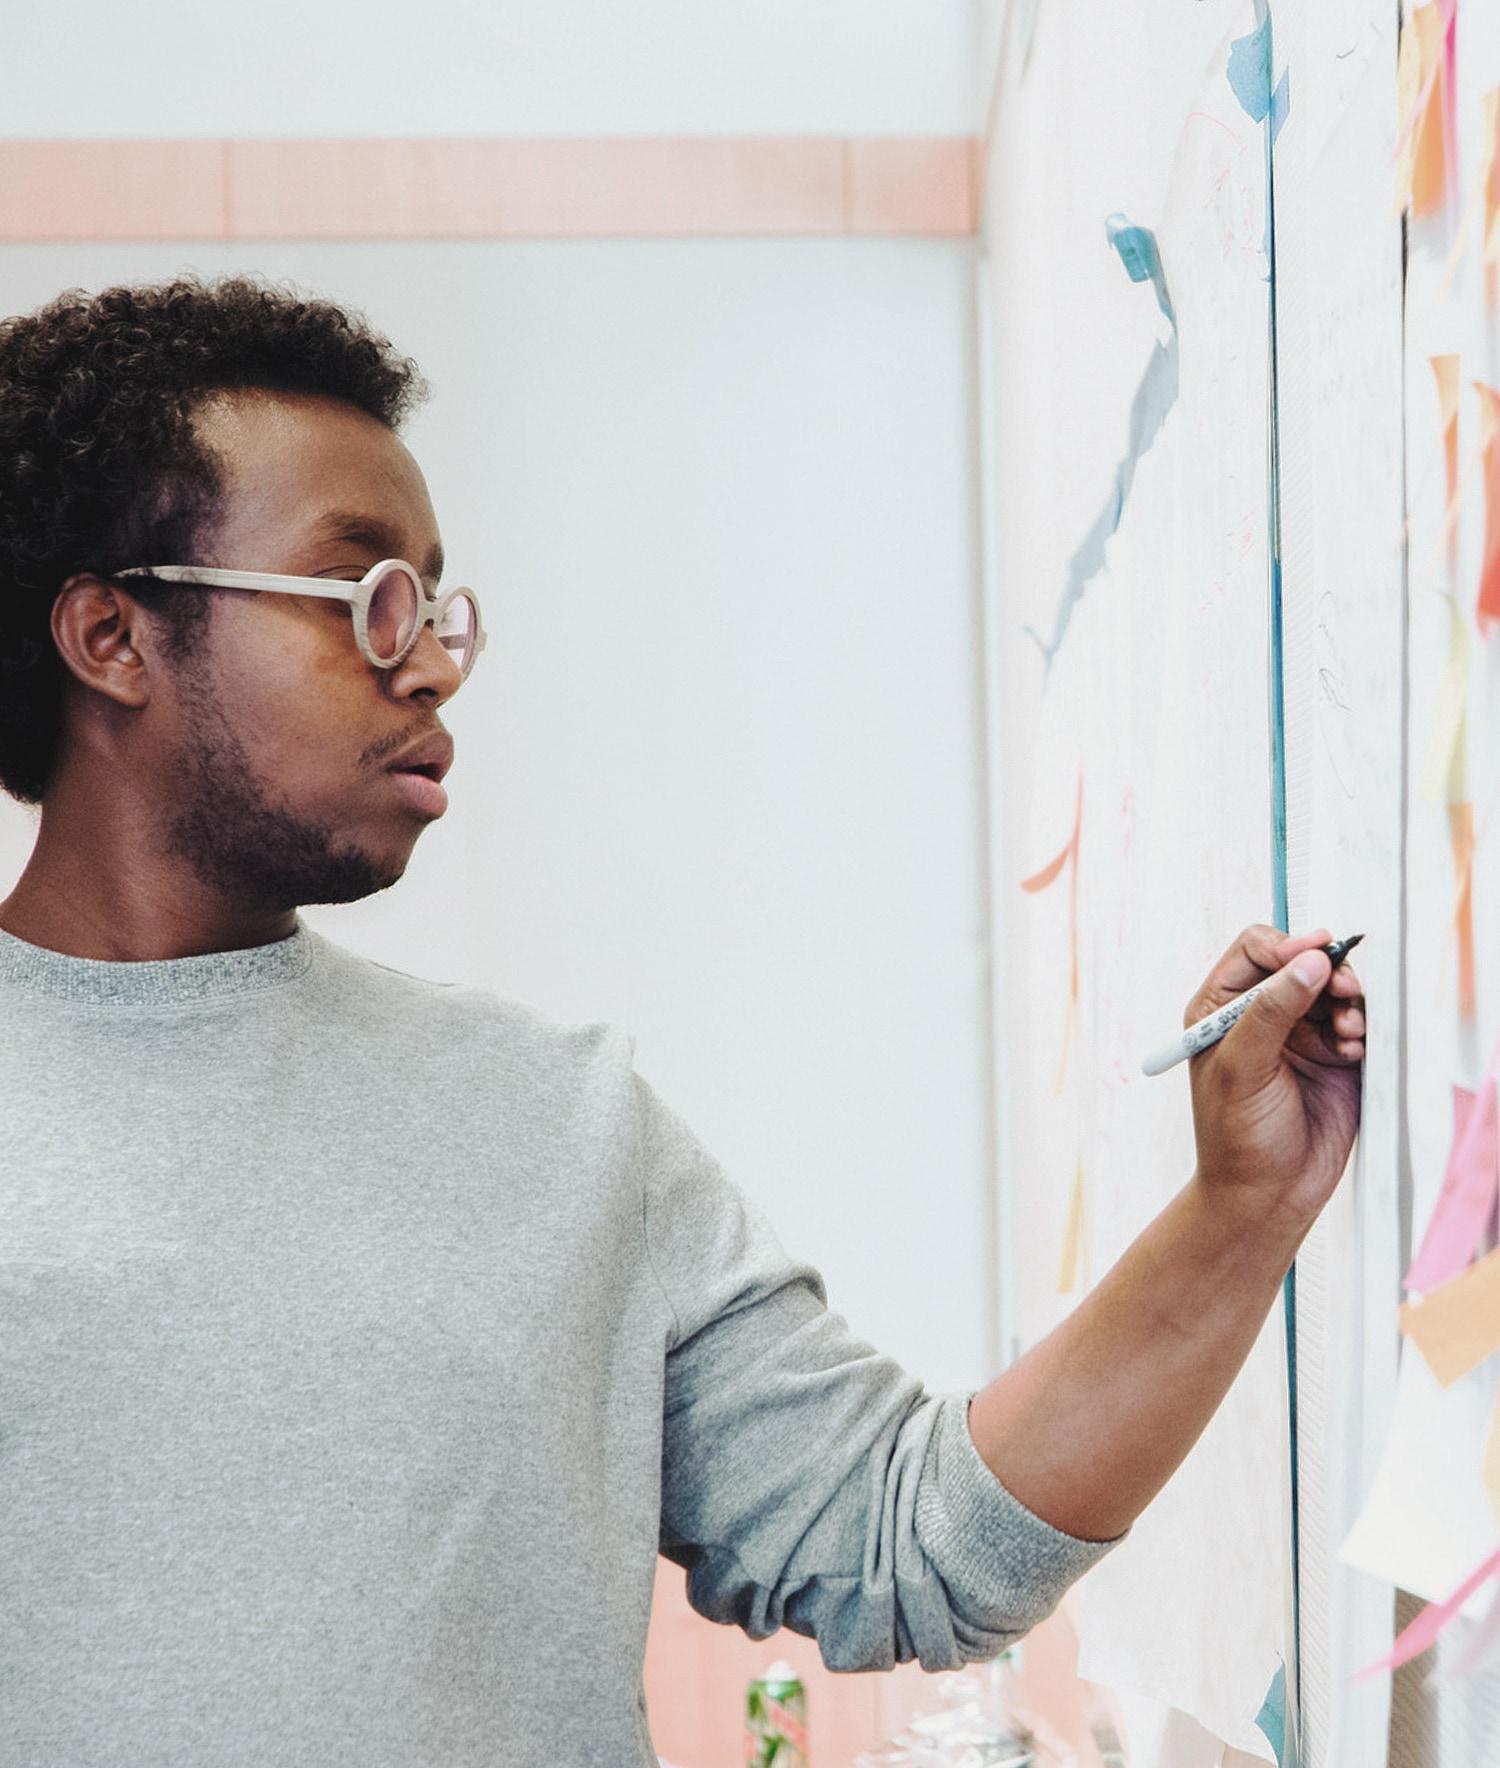 Man writing down business plan on whiteboard